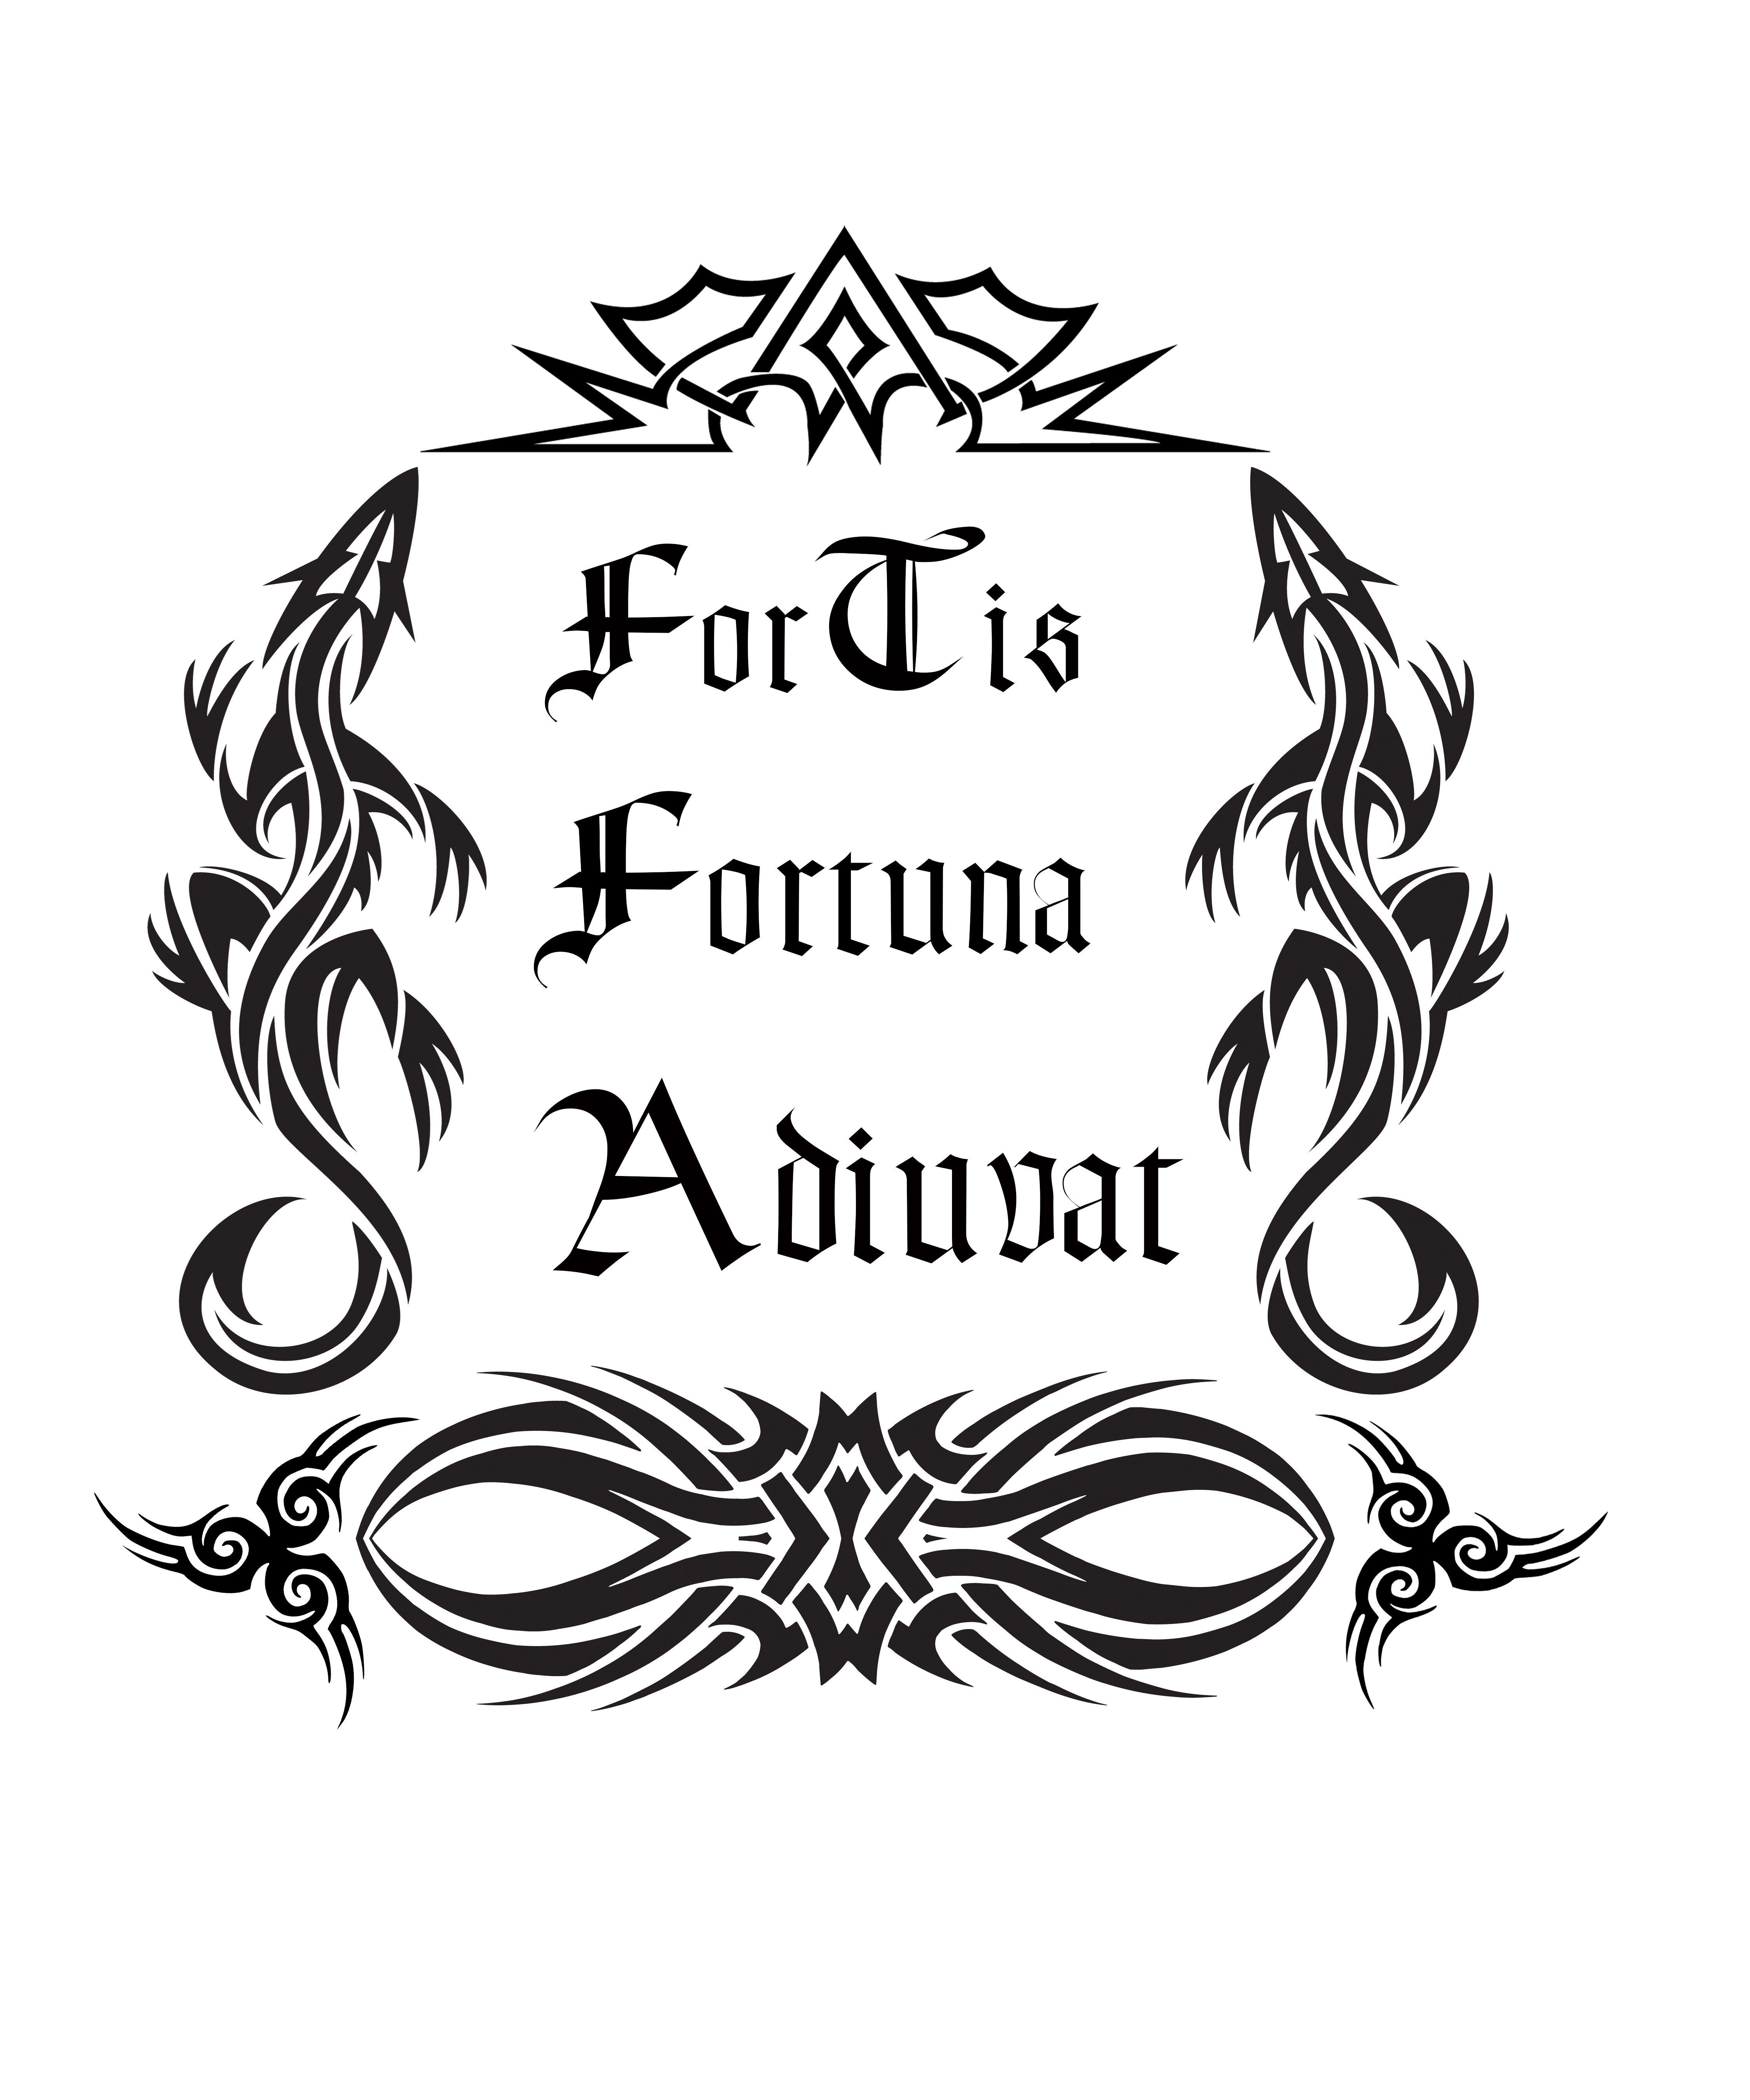 Fortis Fortuna Adiuvat Latina Quotes Tatto Texts Skeches John Wick Quotes John Wick Art John Wick Meme John Wick John Wick Tattoo Latinas Quotes John Wick Meme